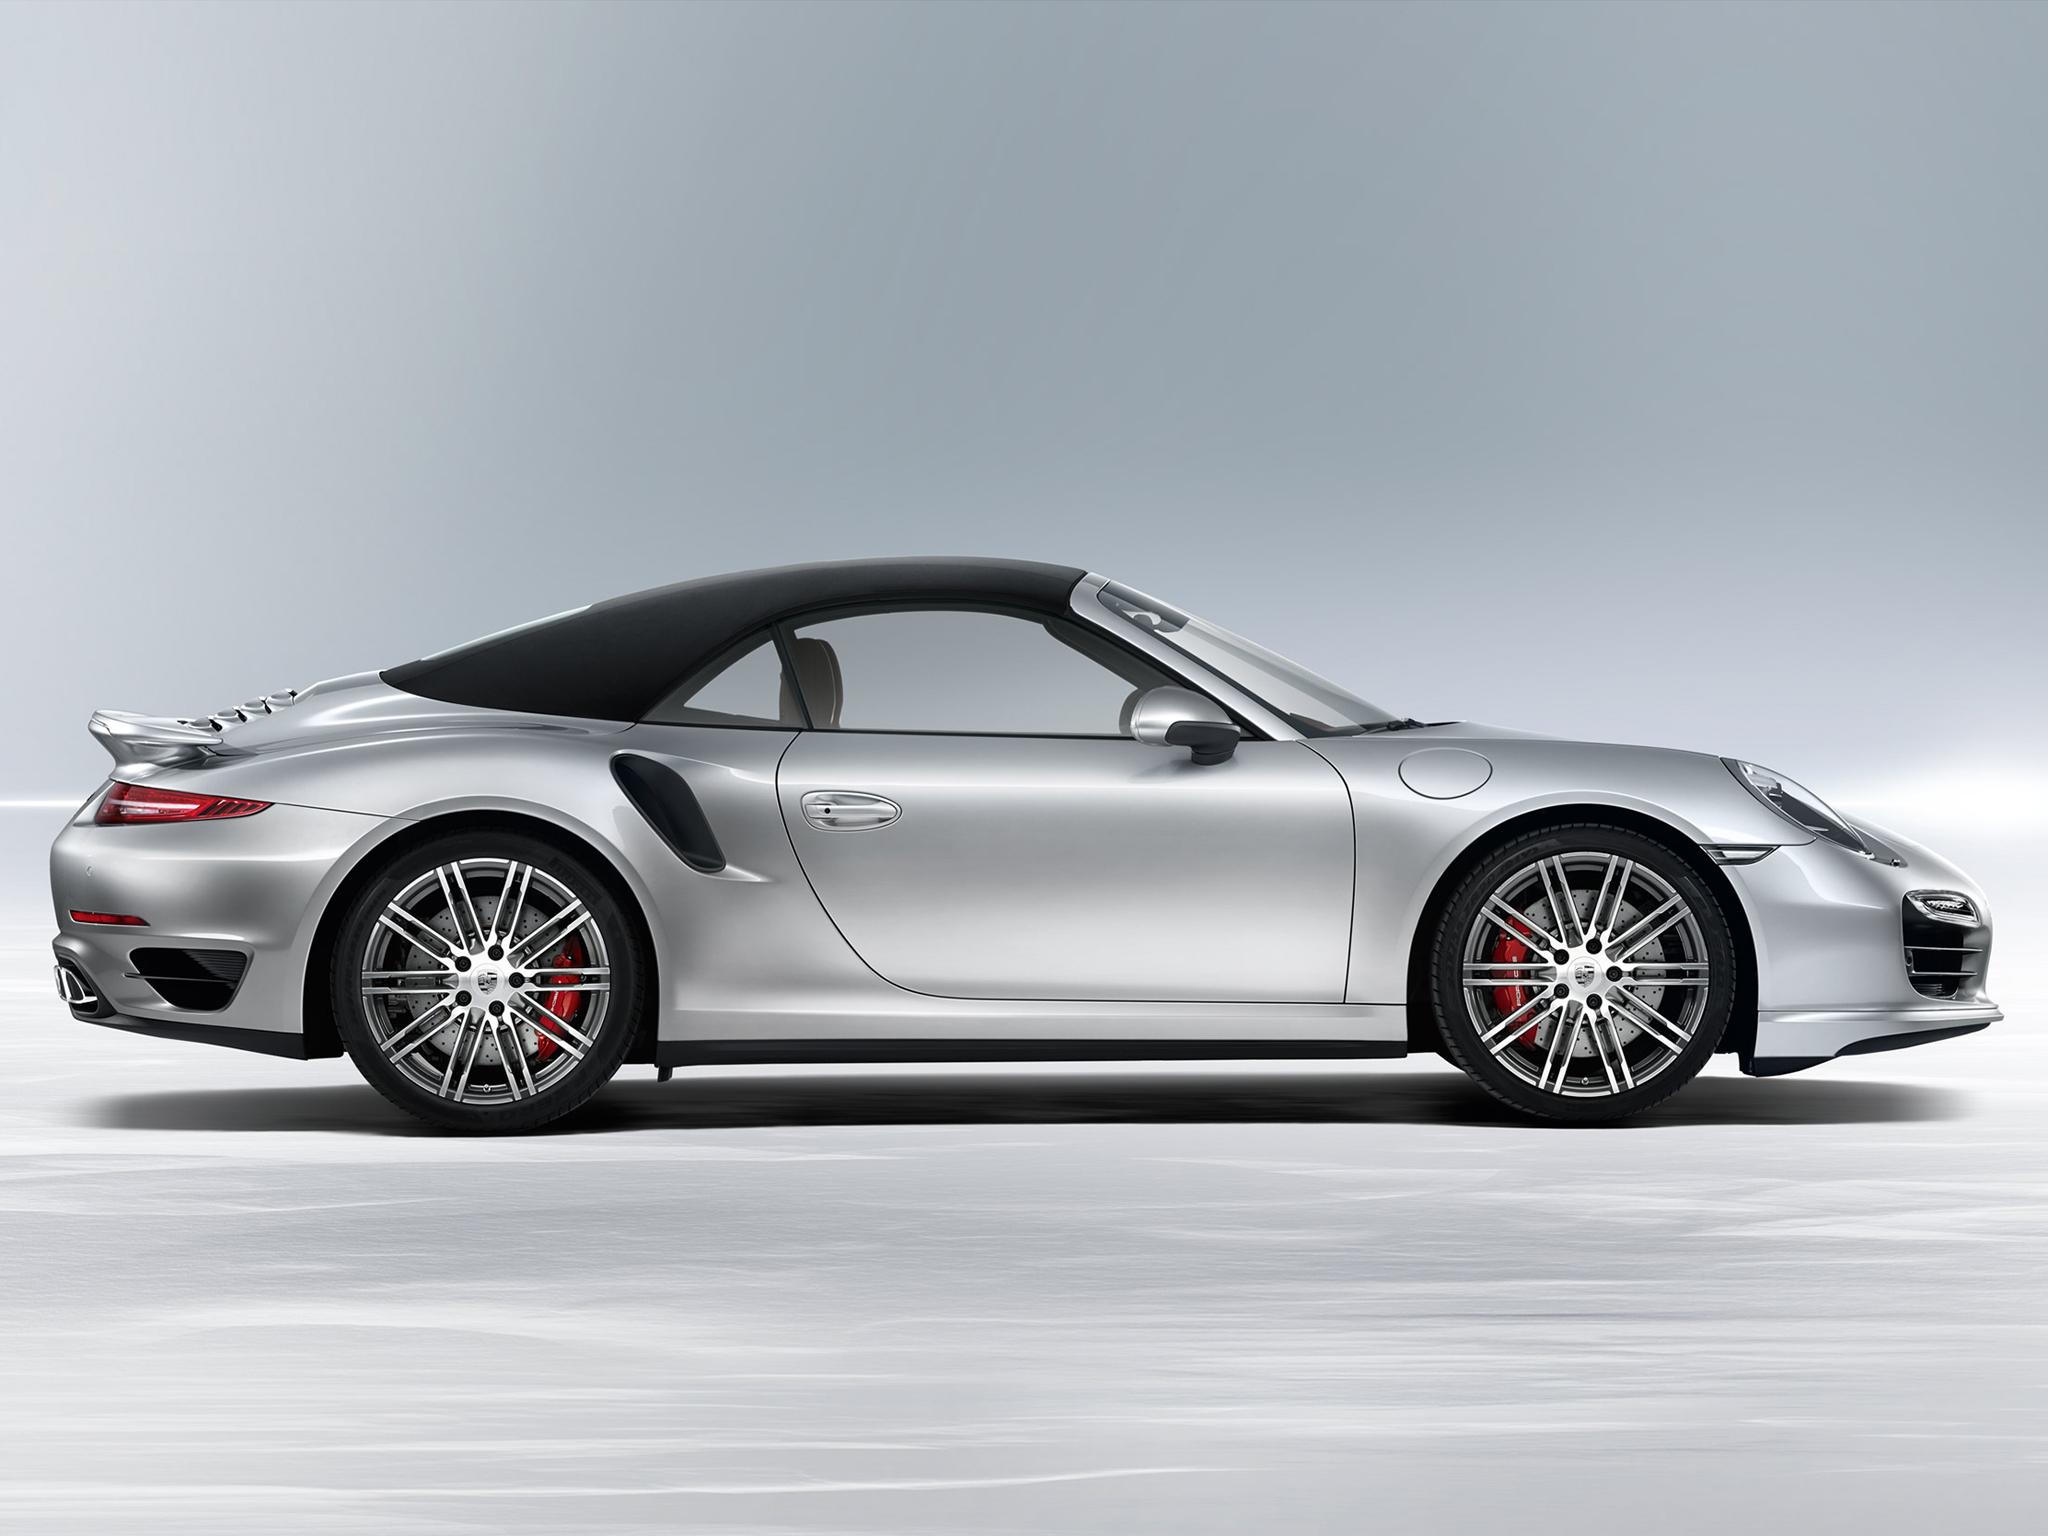 2014 porsche 911 turbo cabriolet 991 g wallpaper 2048x1536 168720 wallpaperup